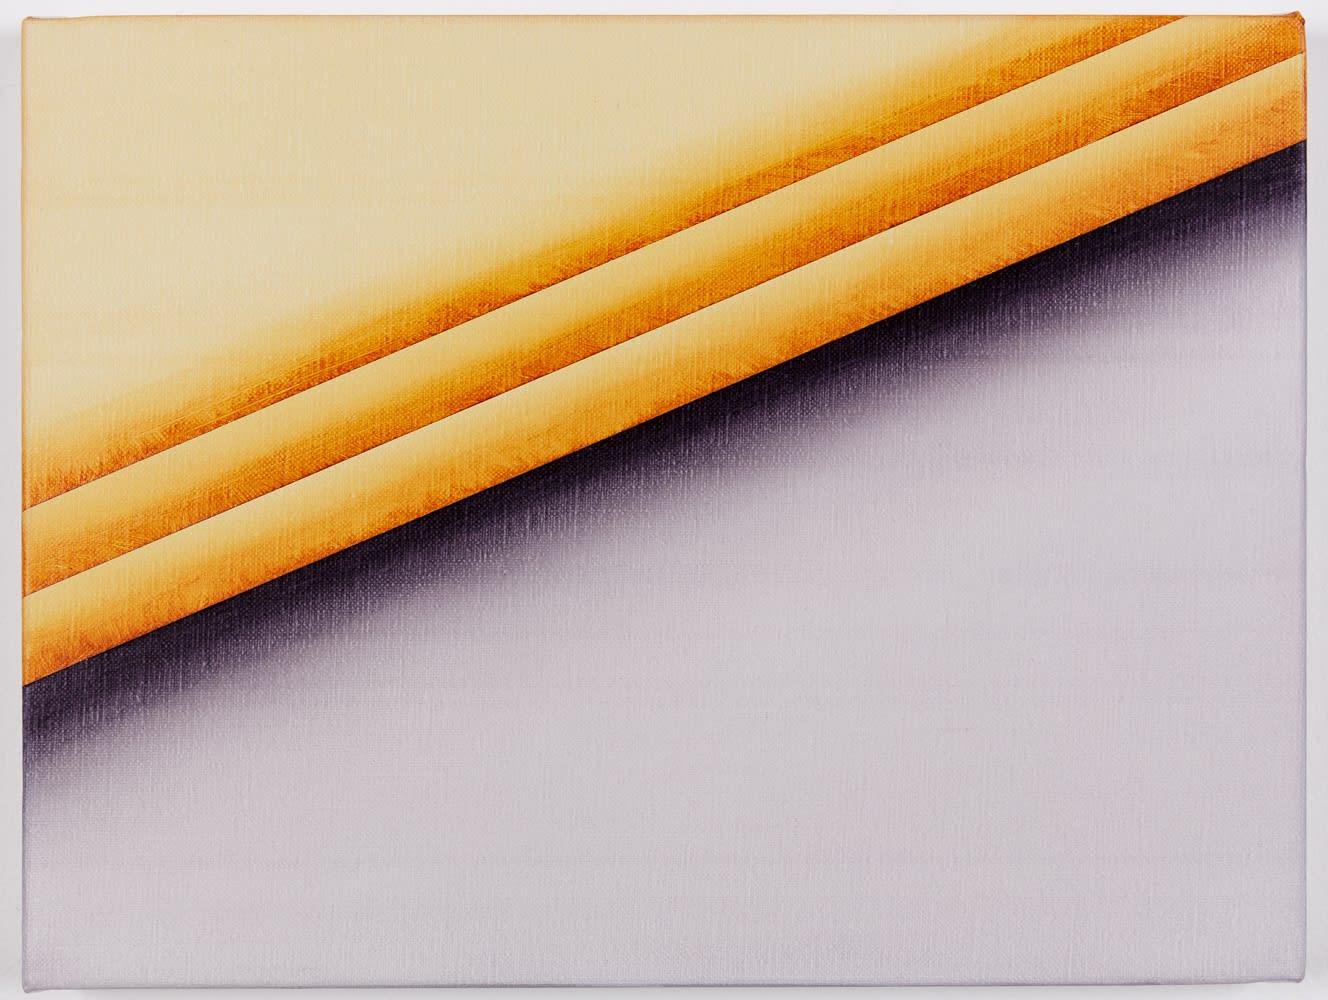 Selma Parlour, Detail Shot, Compile I, 2017